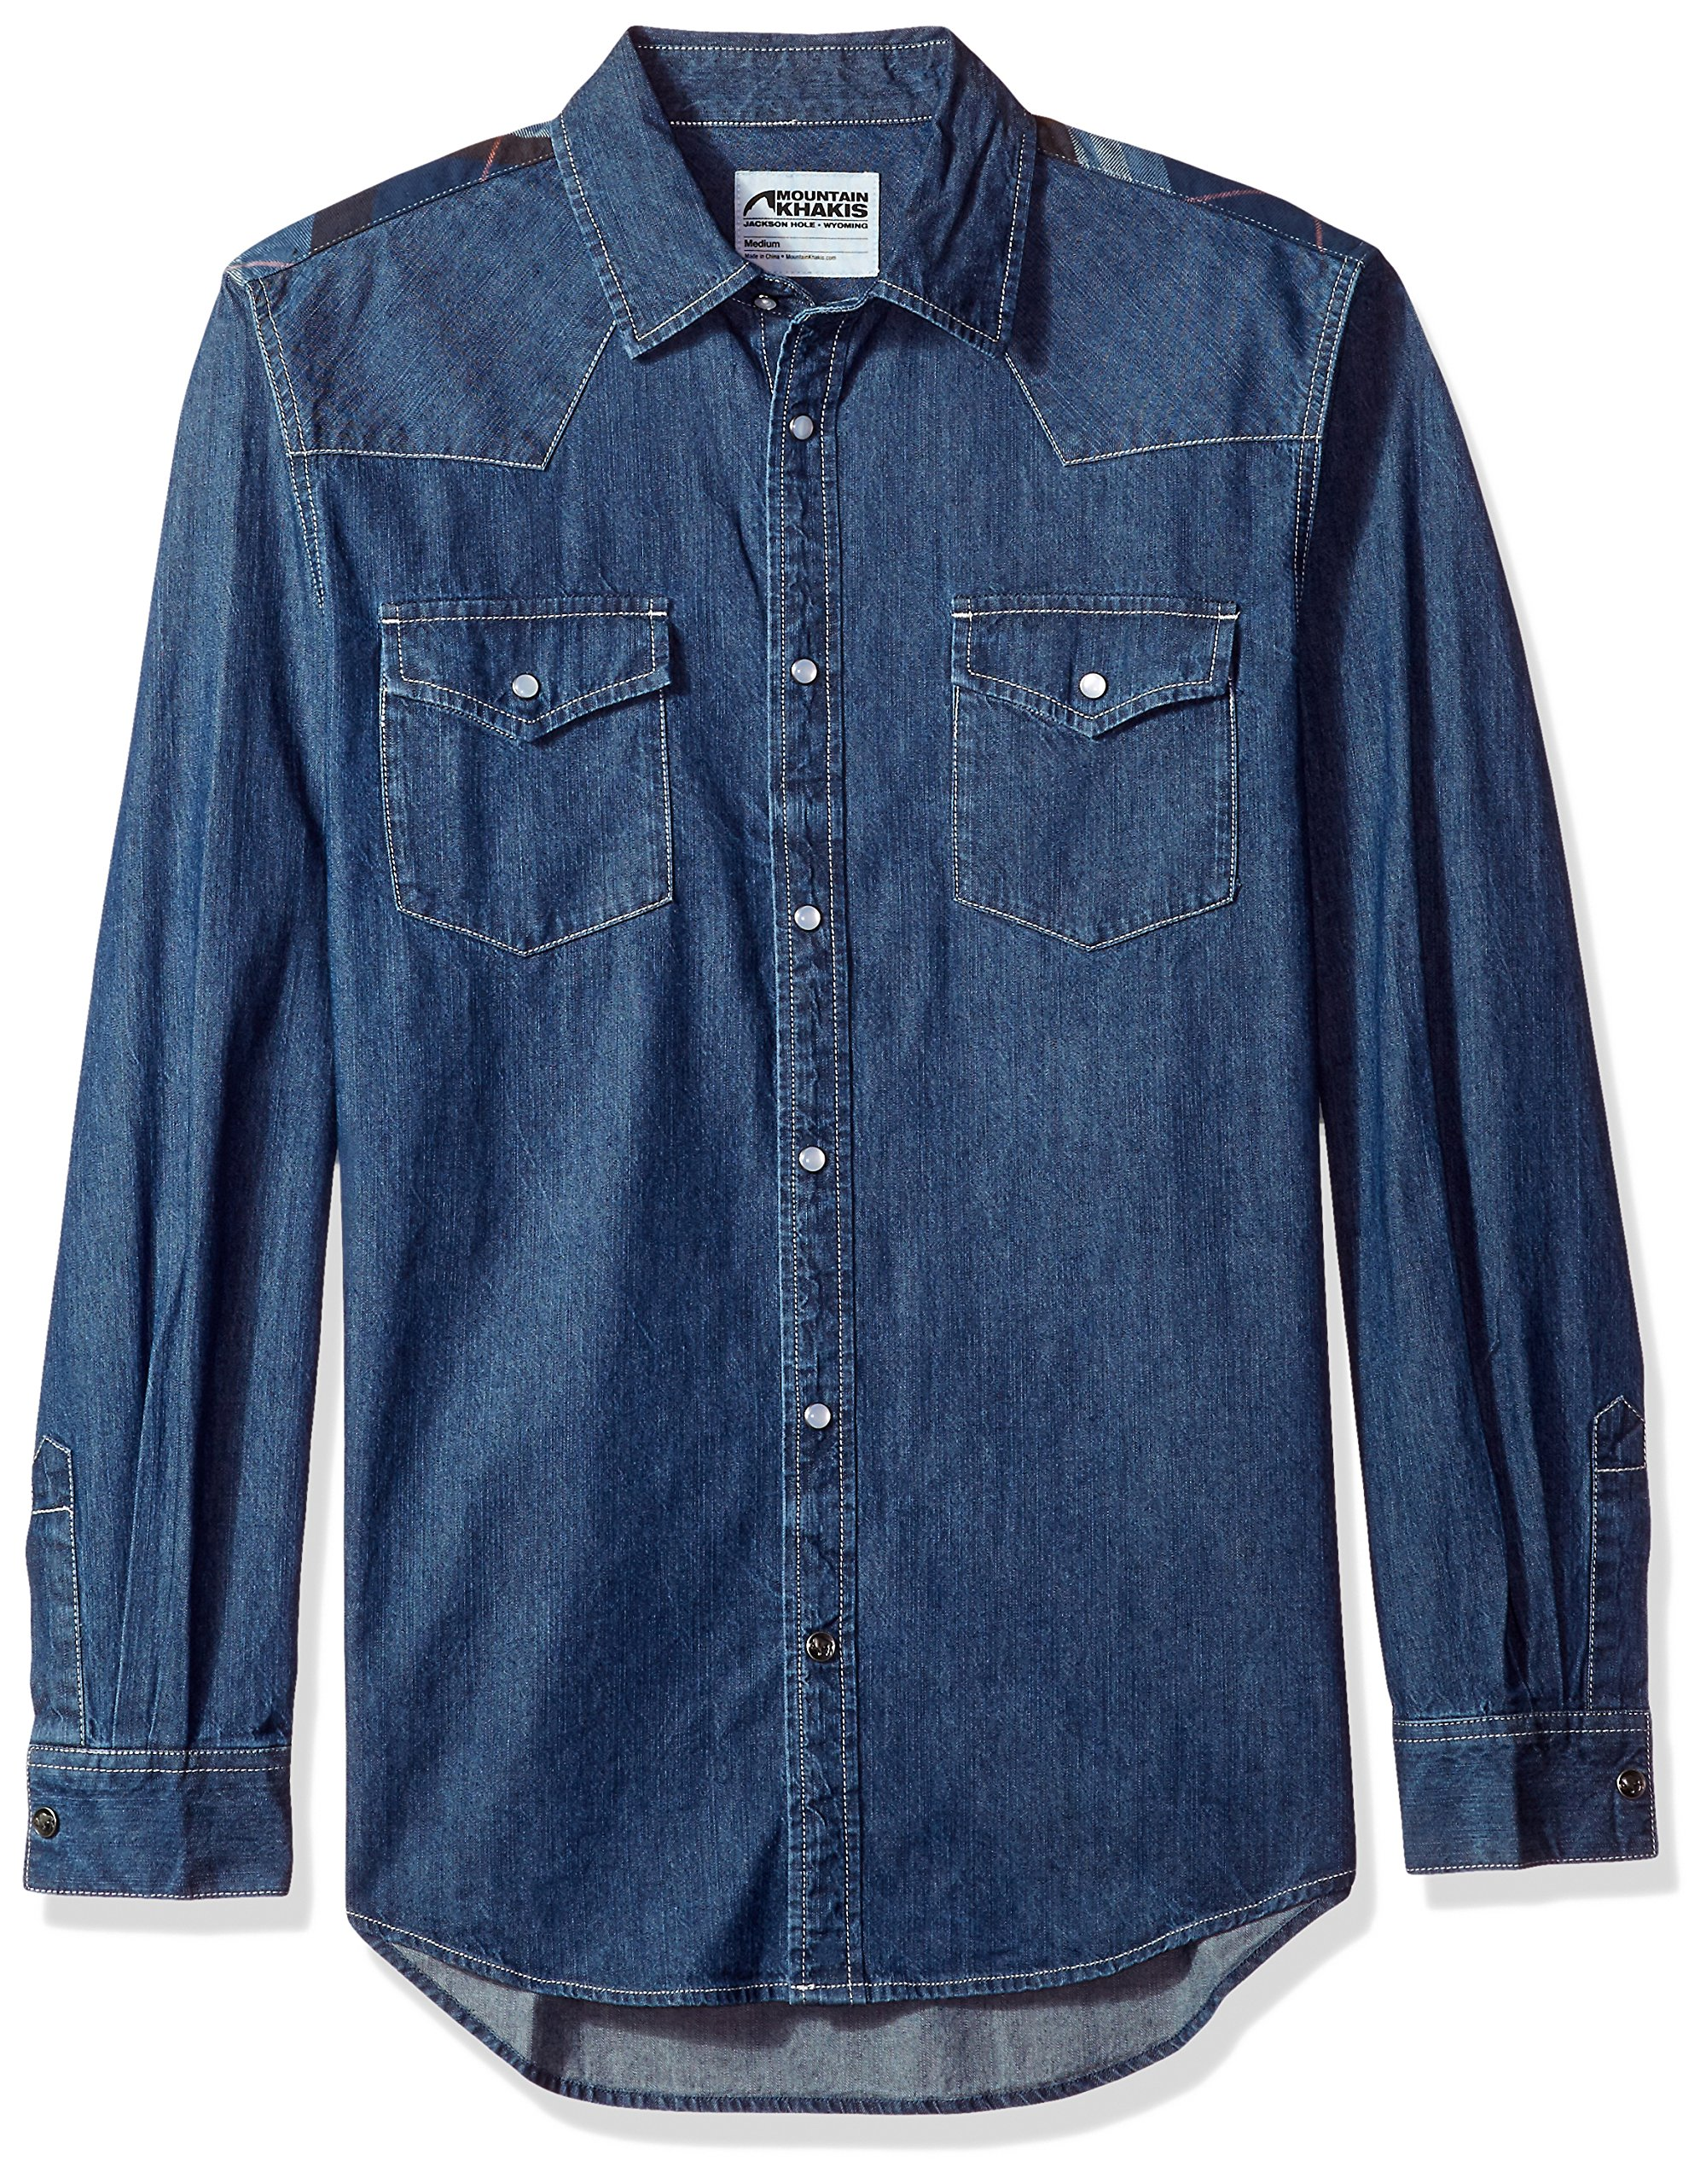 b9503a7cd60 Mountain Khakis Men s Original Mountain Denim Shirt - Denim.Fit